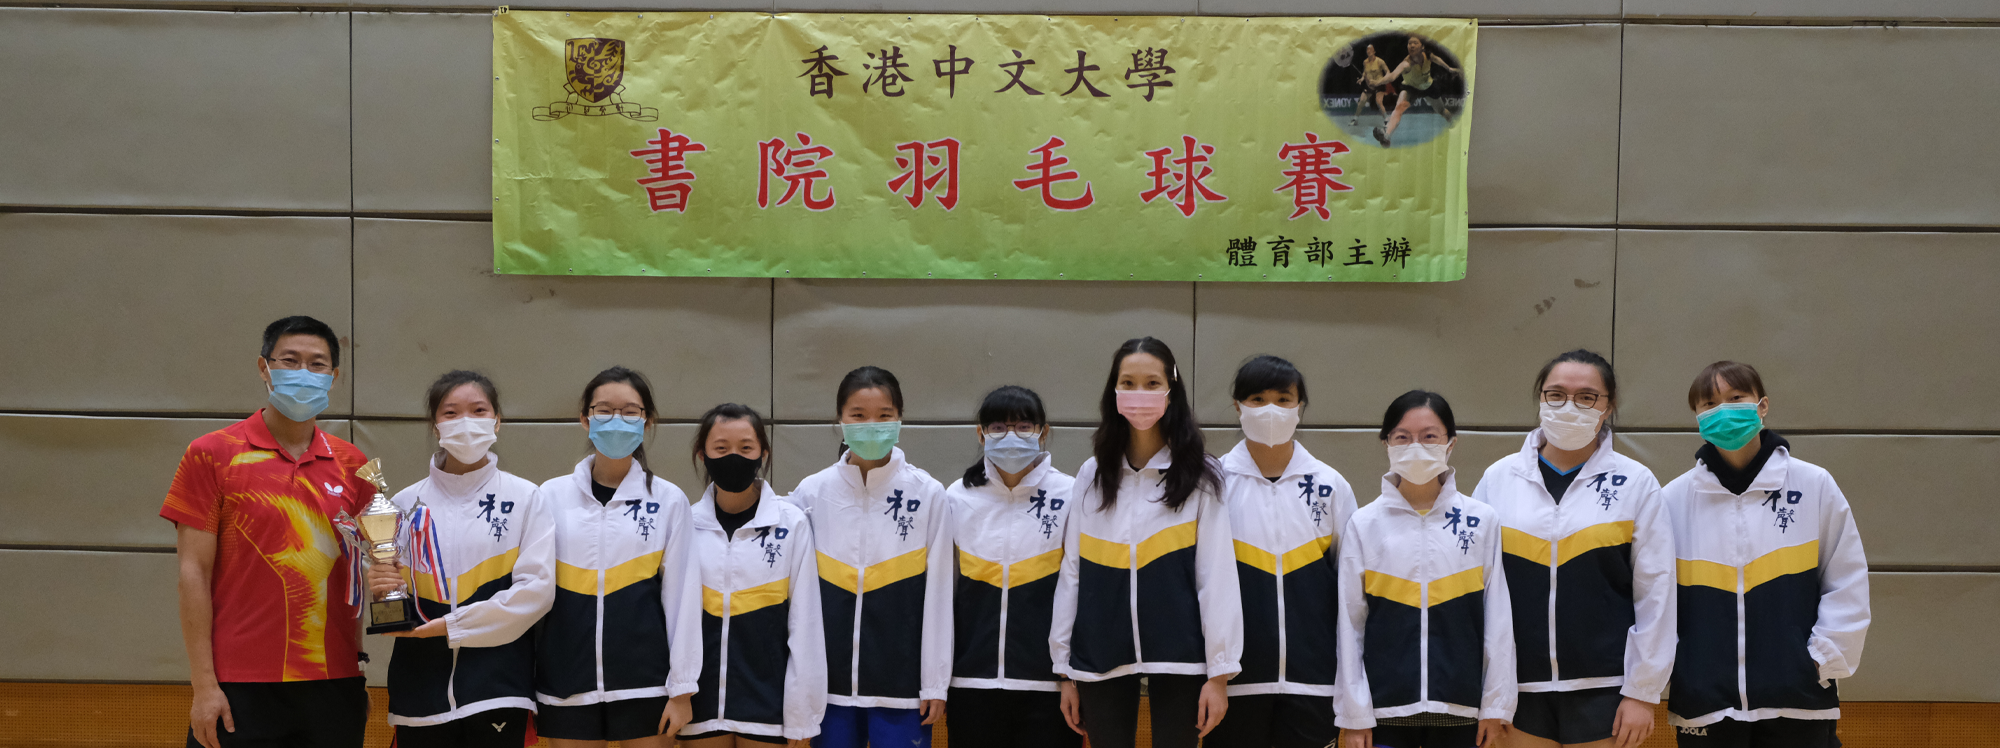 WS Women's Badminton Team 和聲女子羽毛球隊